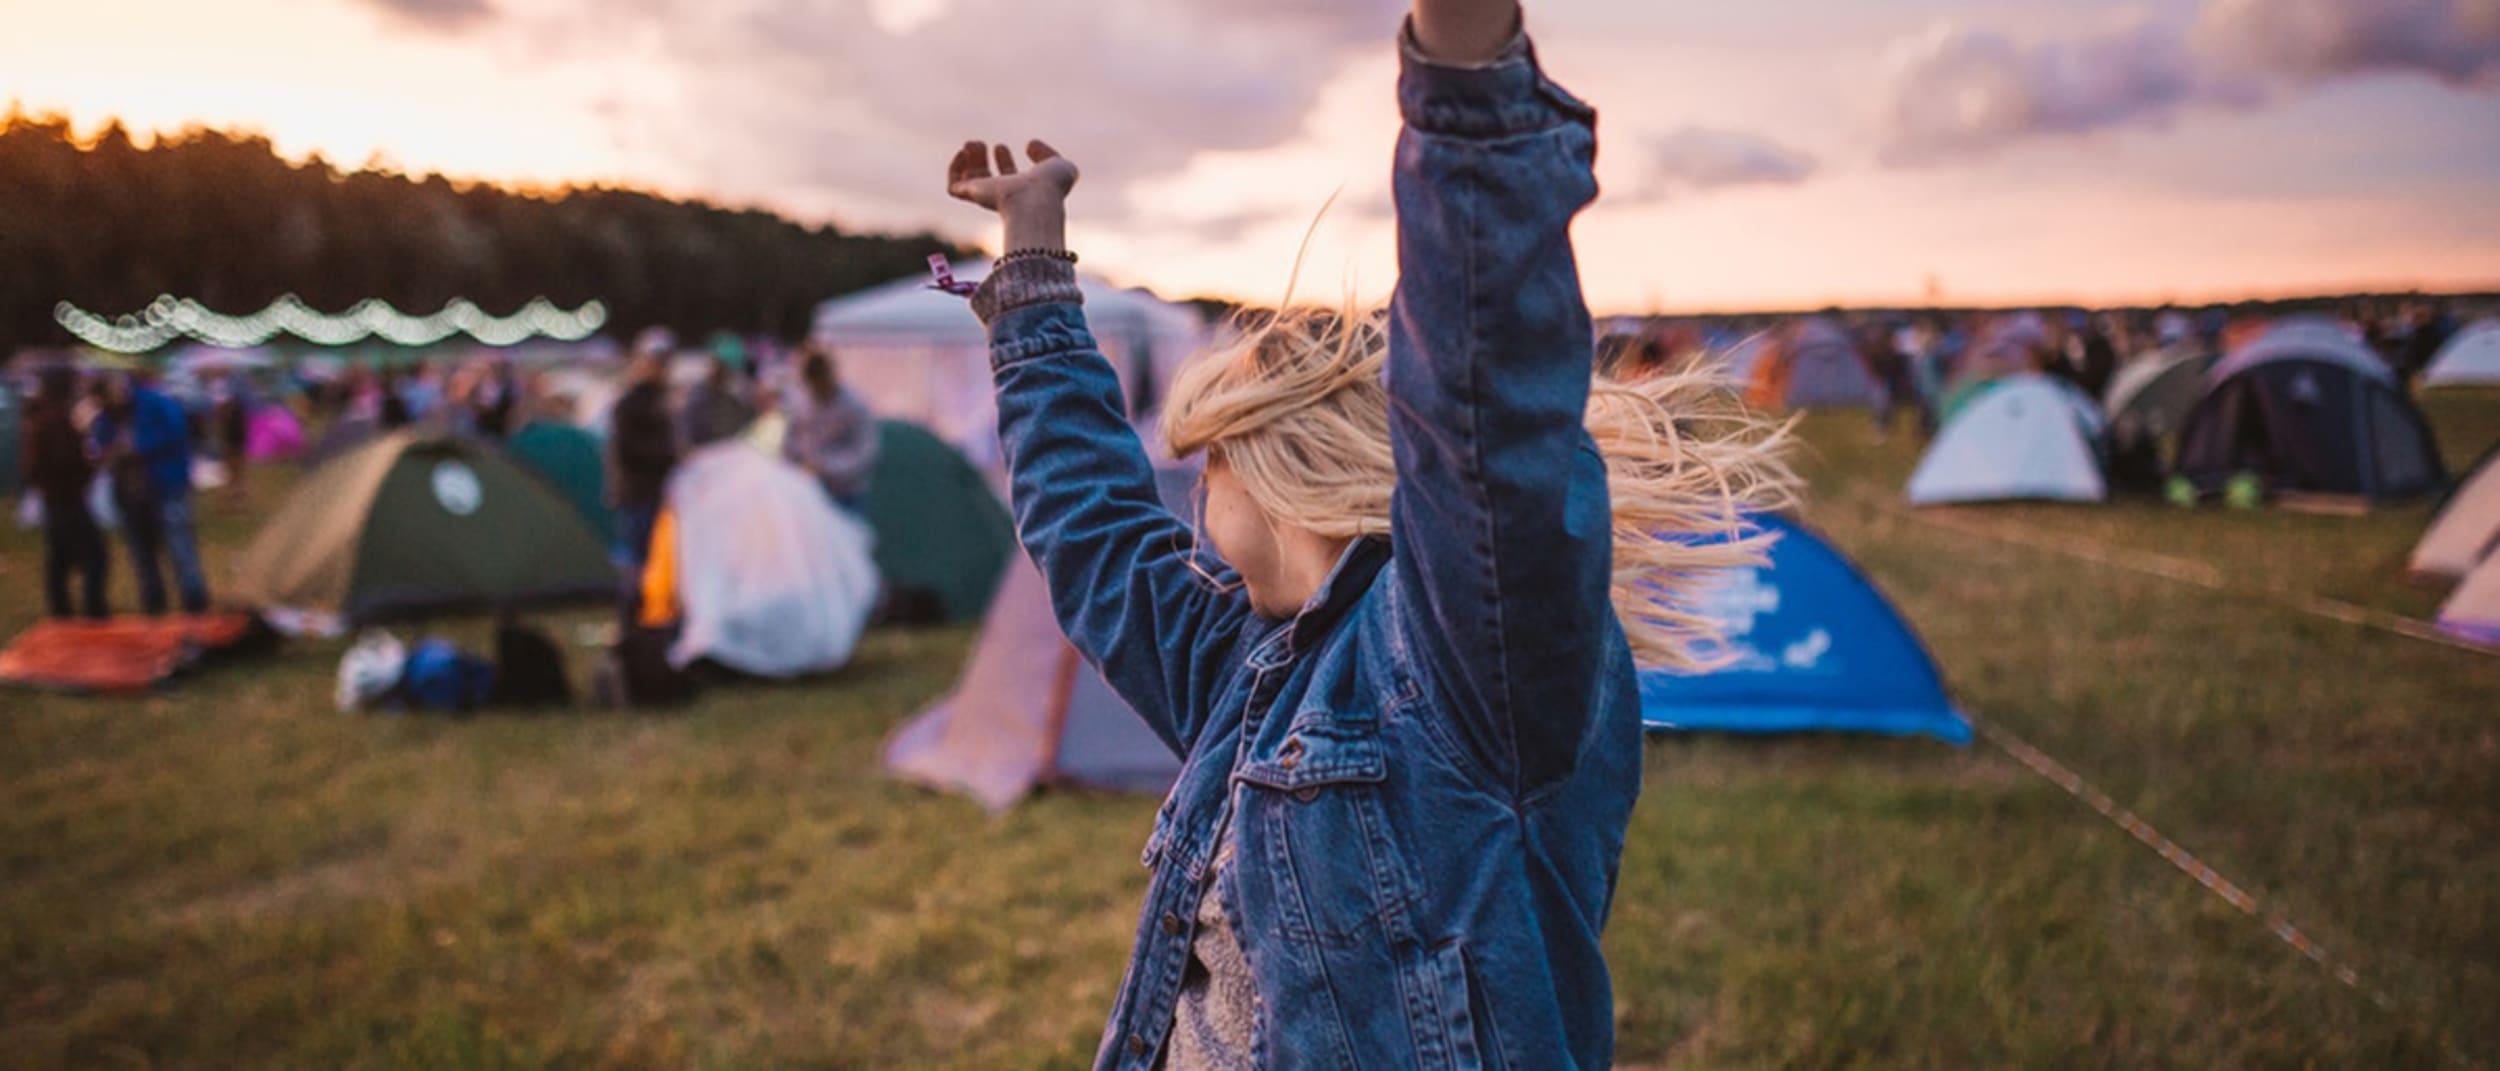 The essential post-festival detox